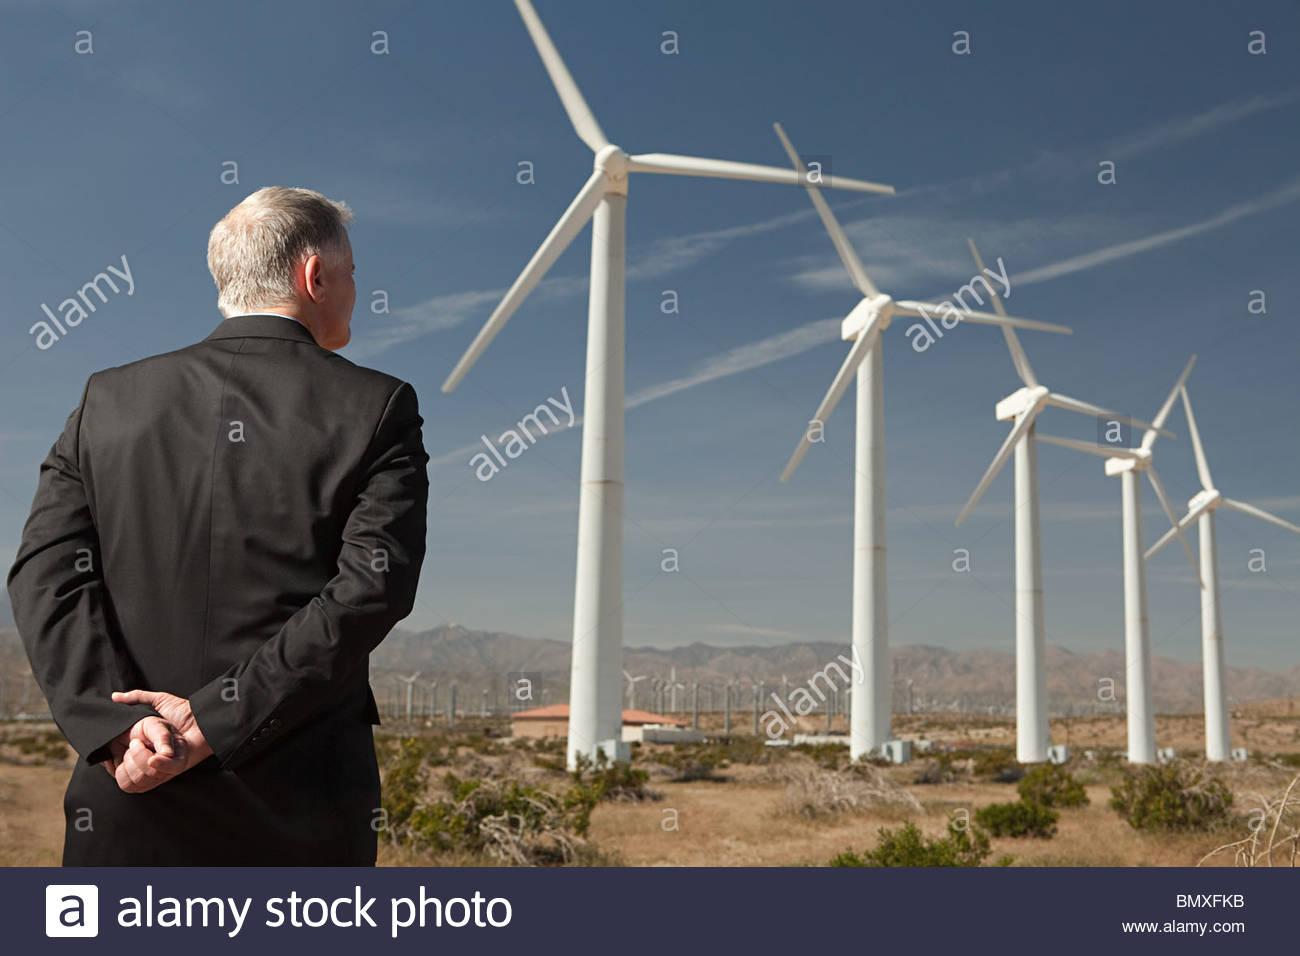 Businessman on a wind farm - Stock Image